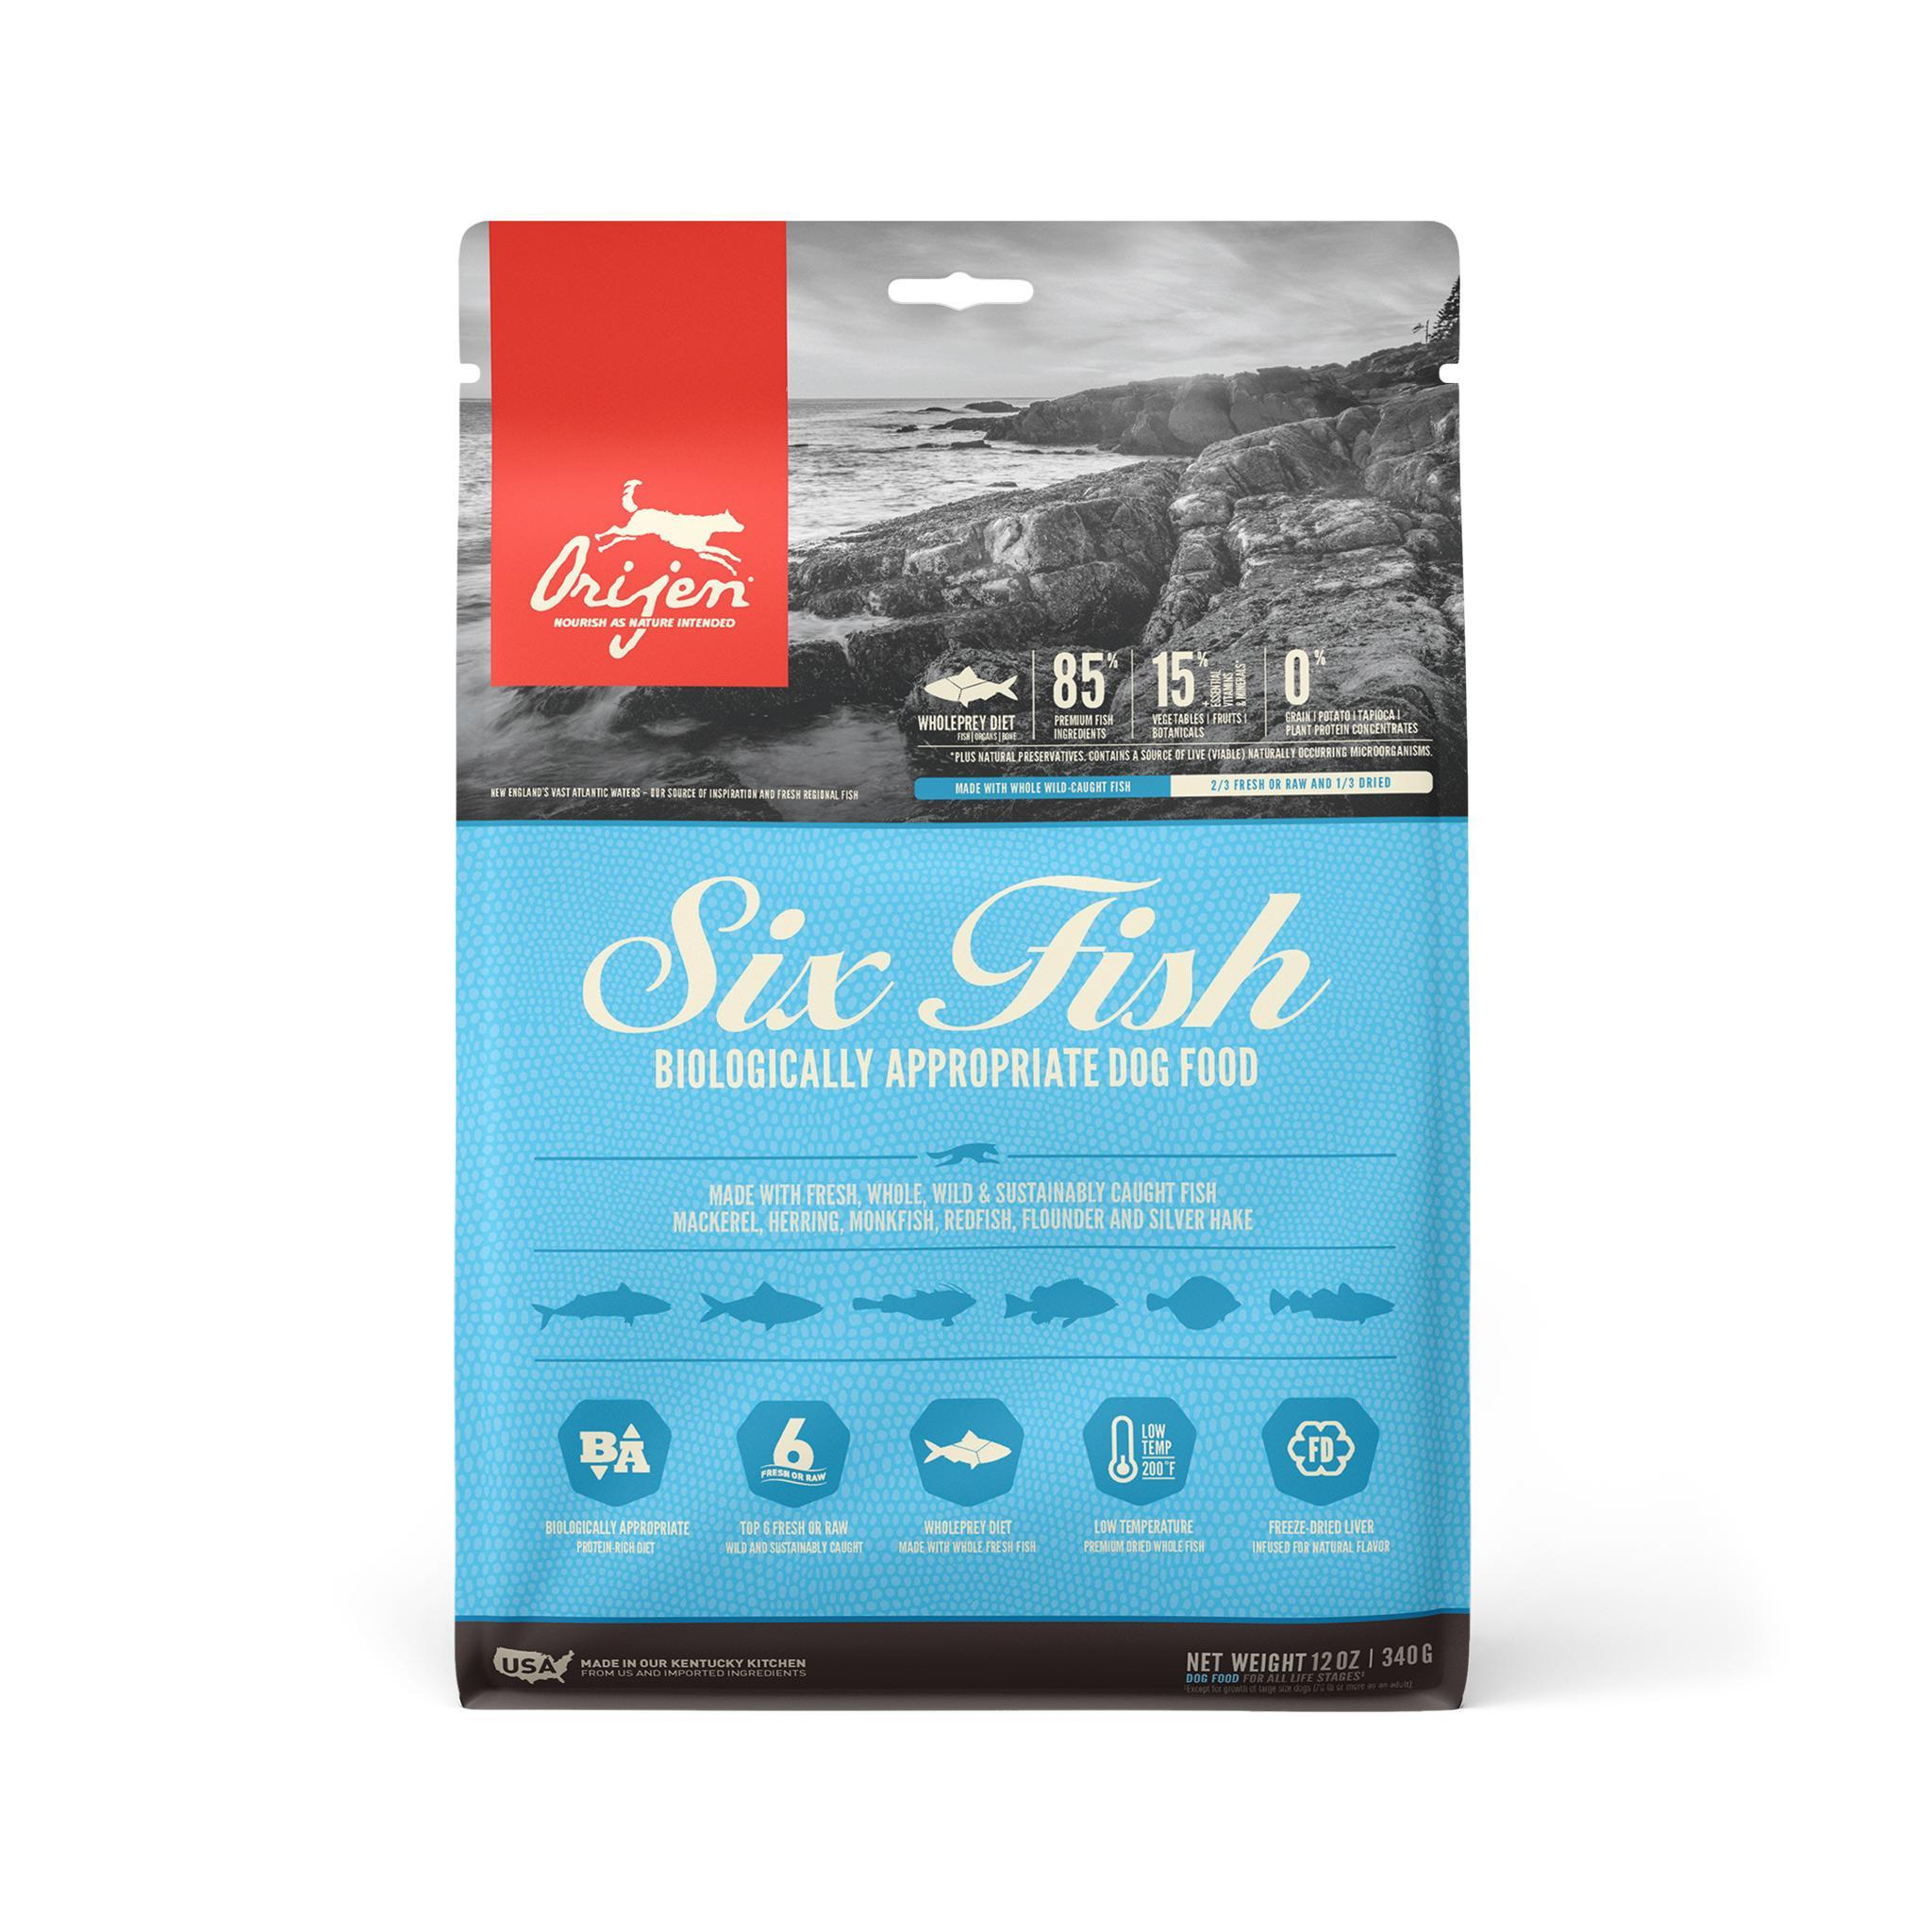 ORIJEN Six Fish Grain-Free Dry Dog Food, 12-oz